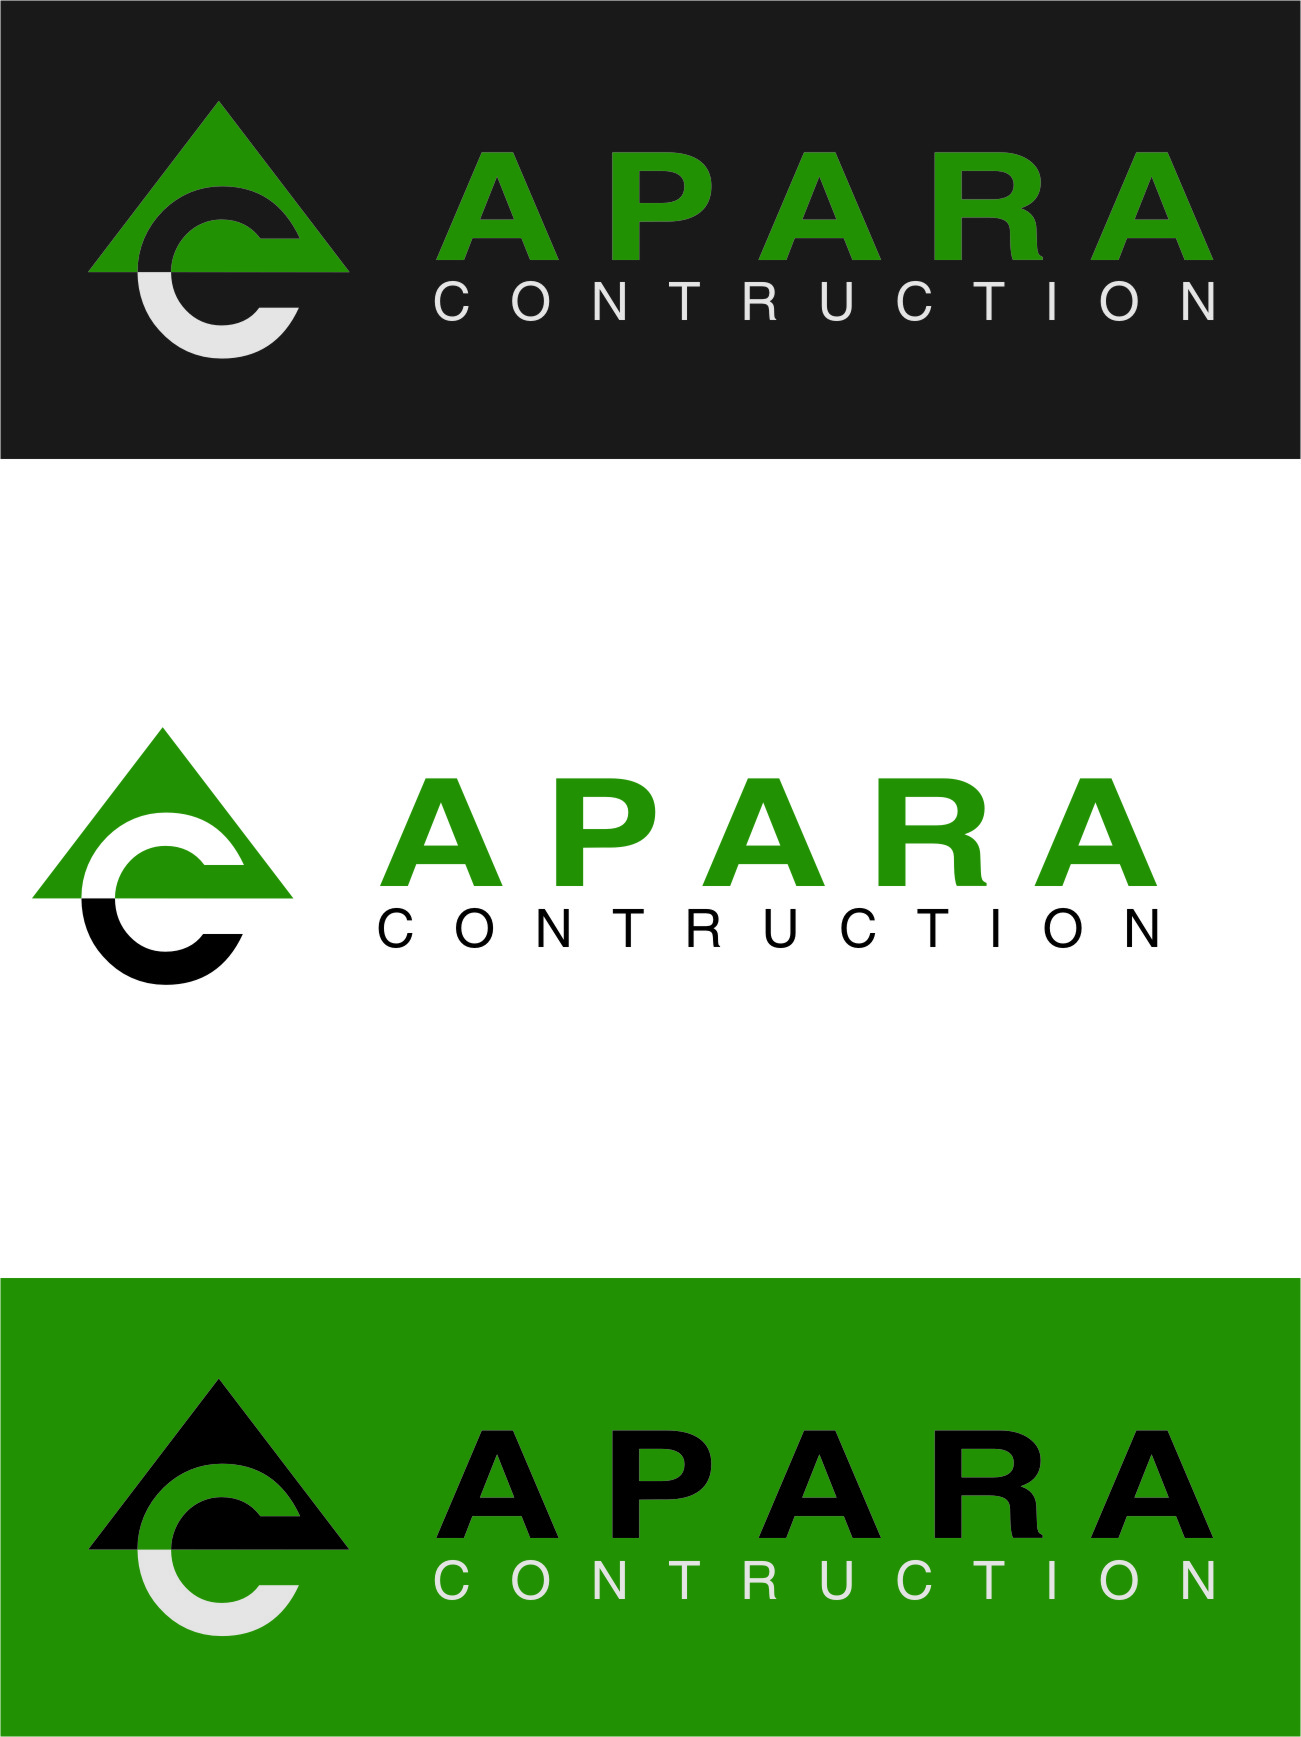 Logo Design by Ngepet_art - Entry No. 197 in the Logo Design Contest Apara Construction Logo Design.